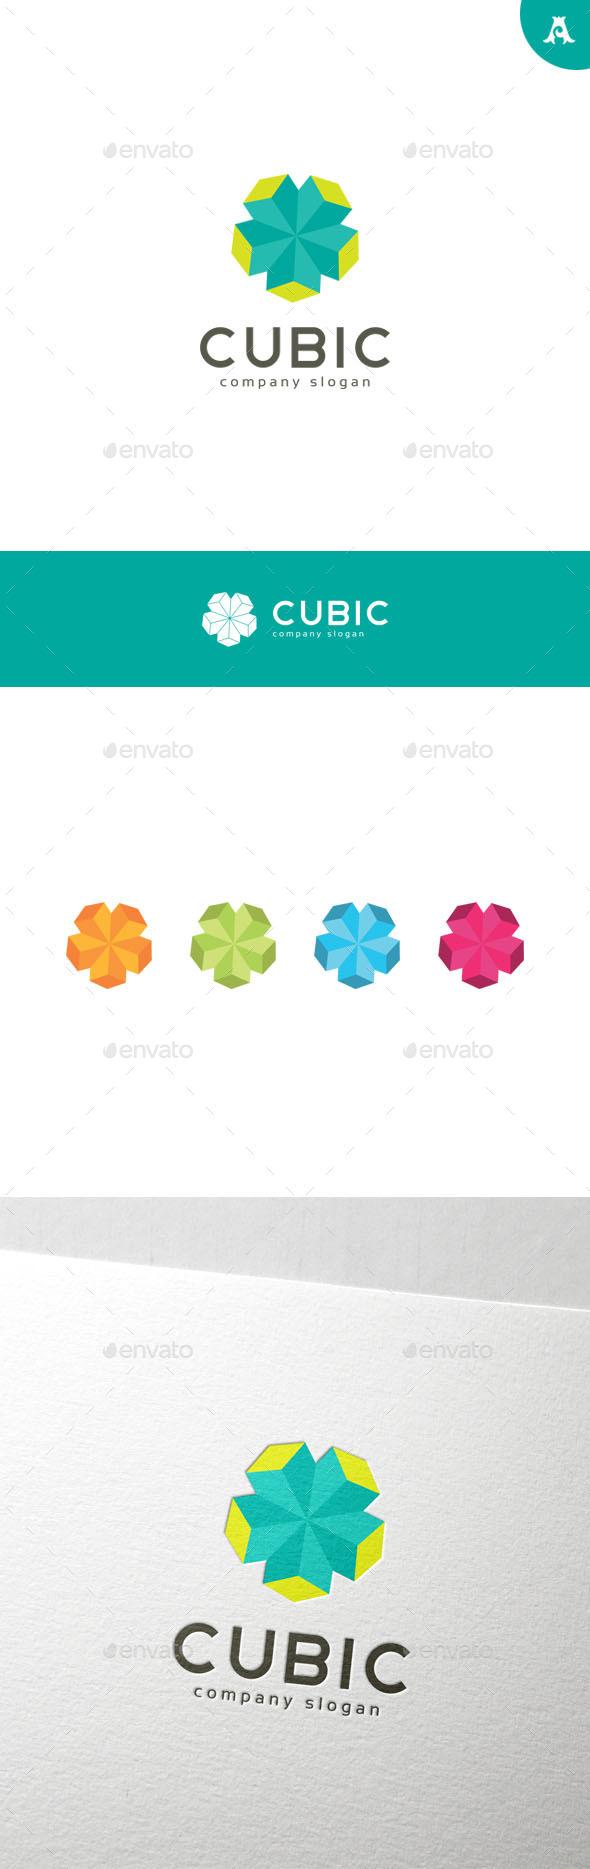 GraphicRiver Cubic Logo 9993649